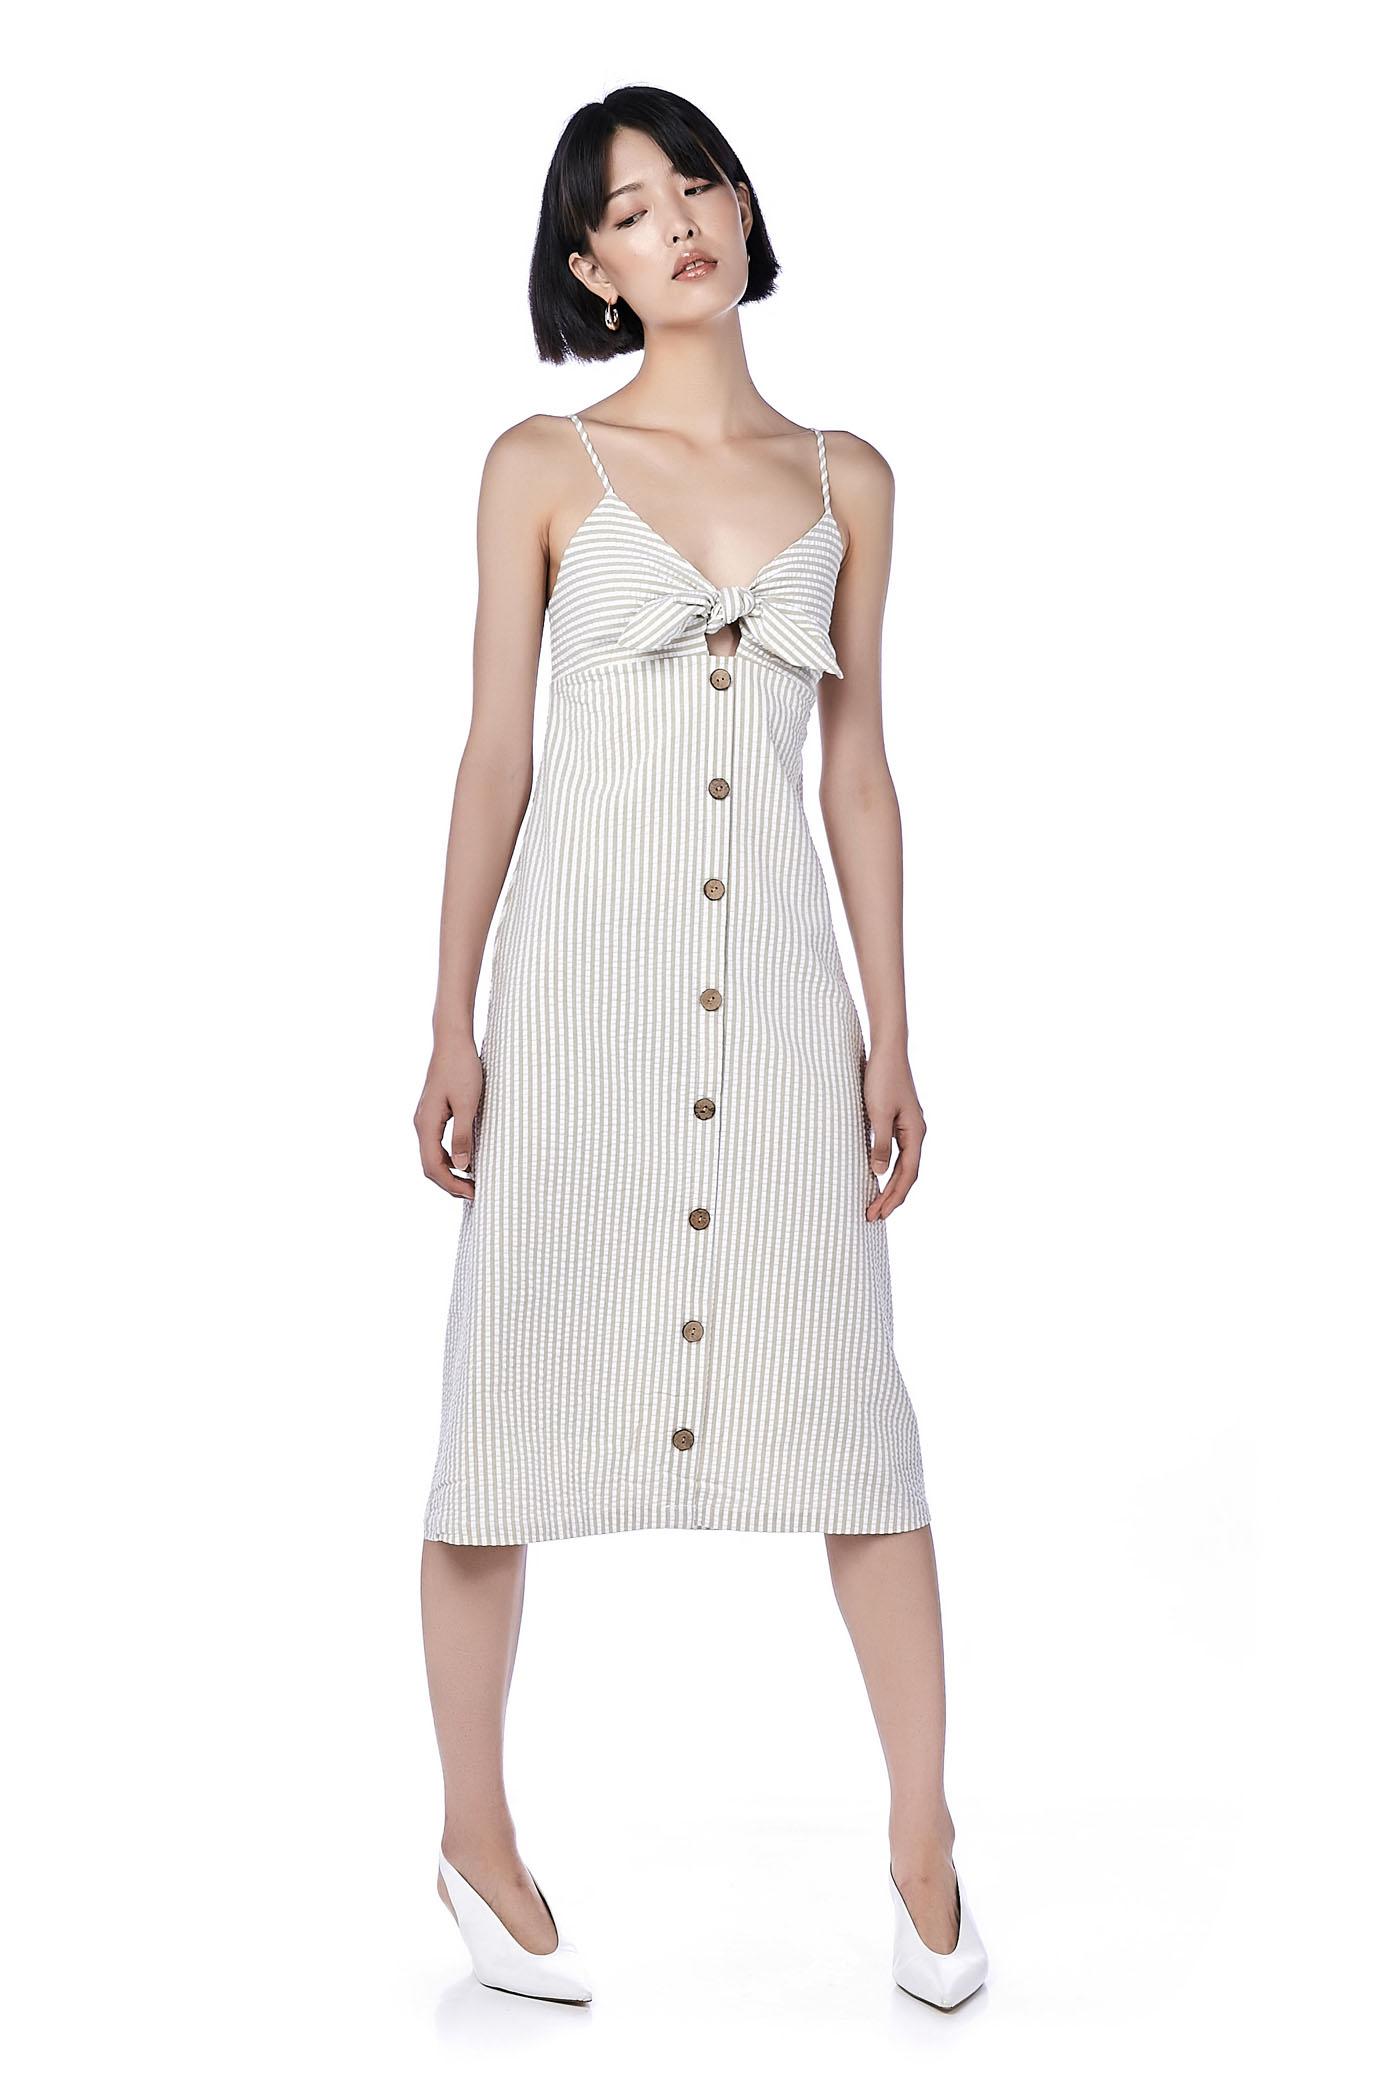 983b5a86d8c Daisy Front-Tie Midi Dress